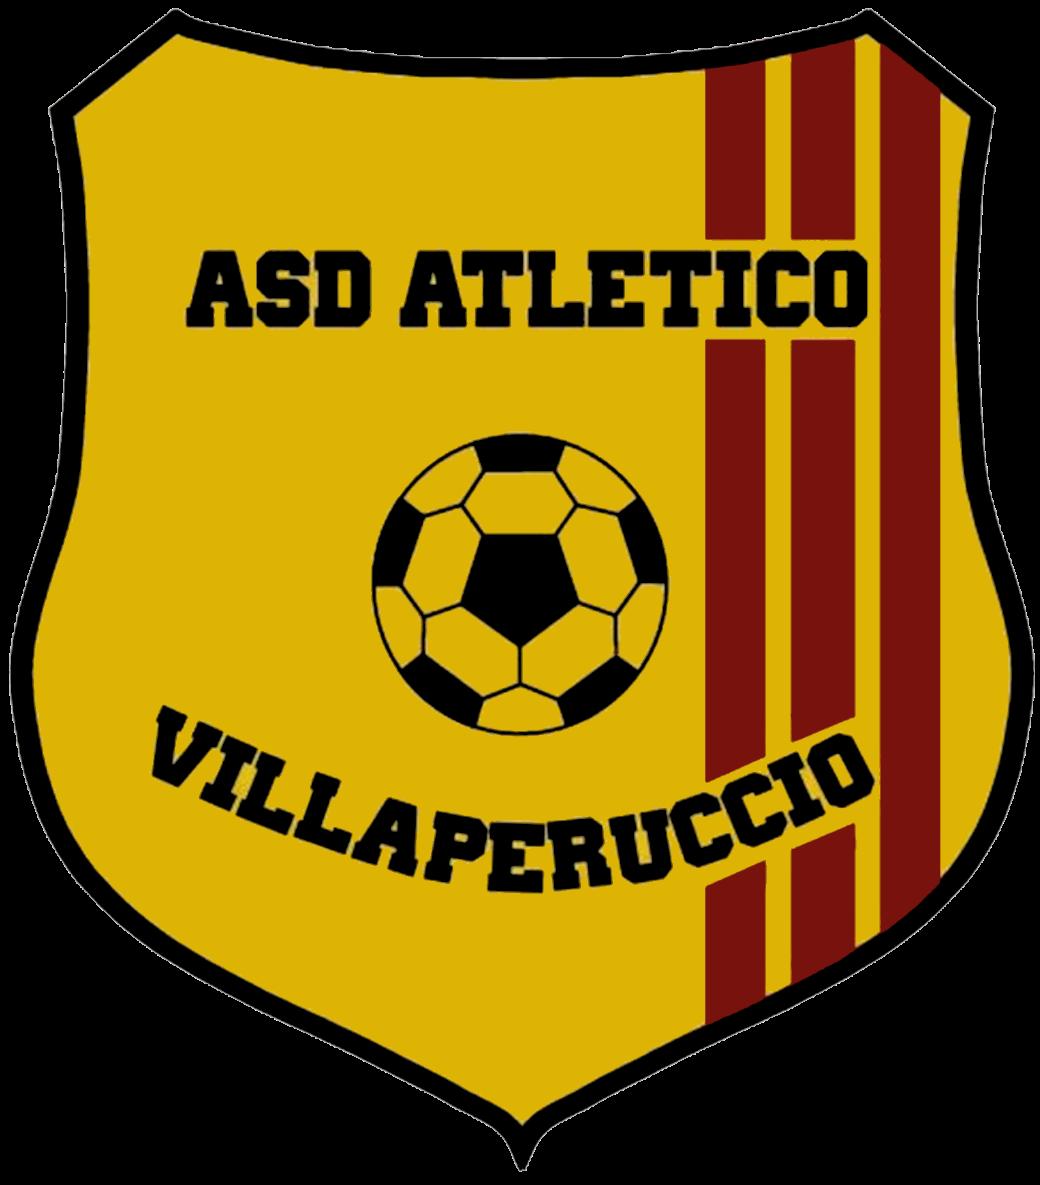 Calendario Prima Categoria Sardegna.Atletico Villaperuccio 06 Calendario Squadra Sardegna